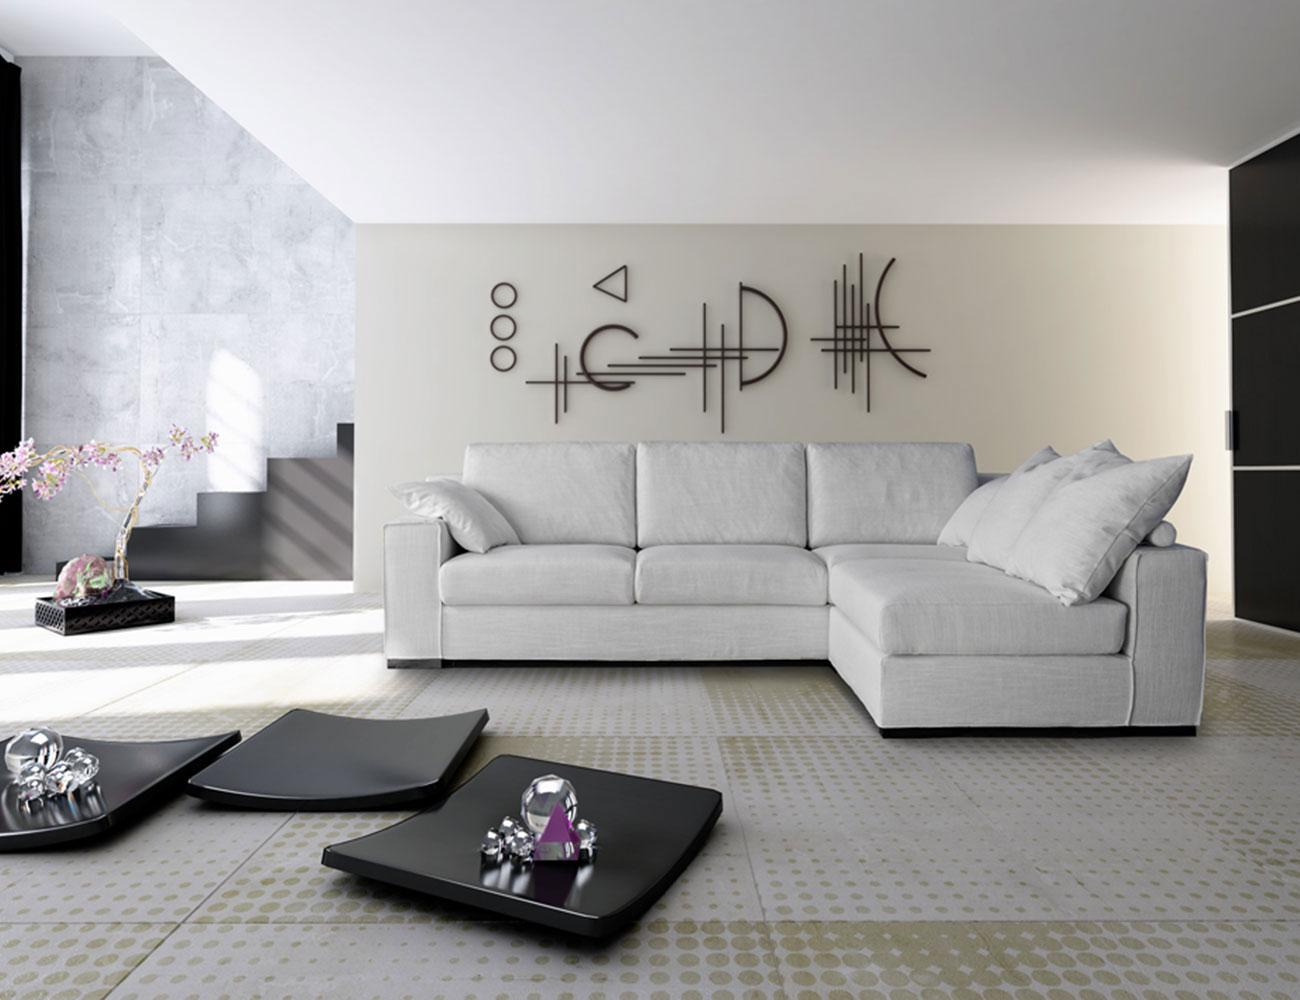 Lambri arredamenti vendita mobili classici di design e for Errebi arredamenti